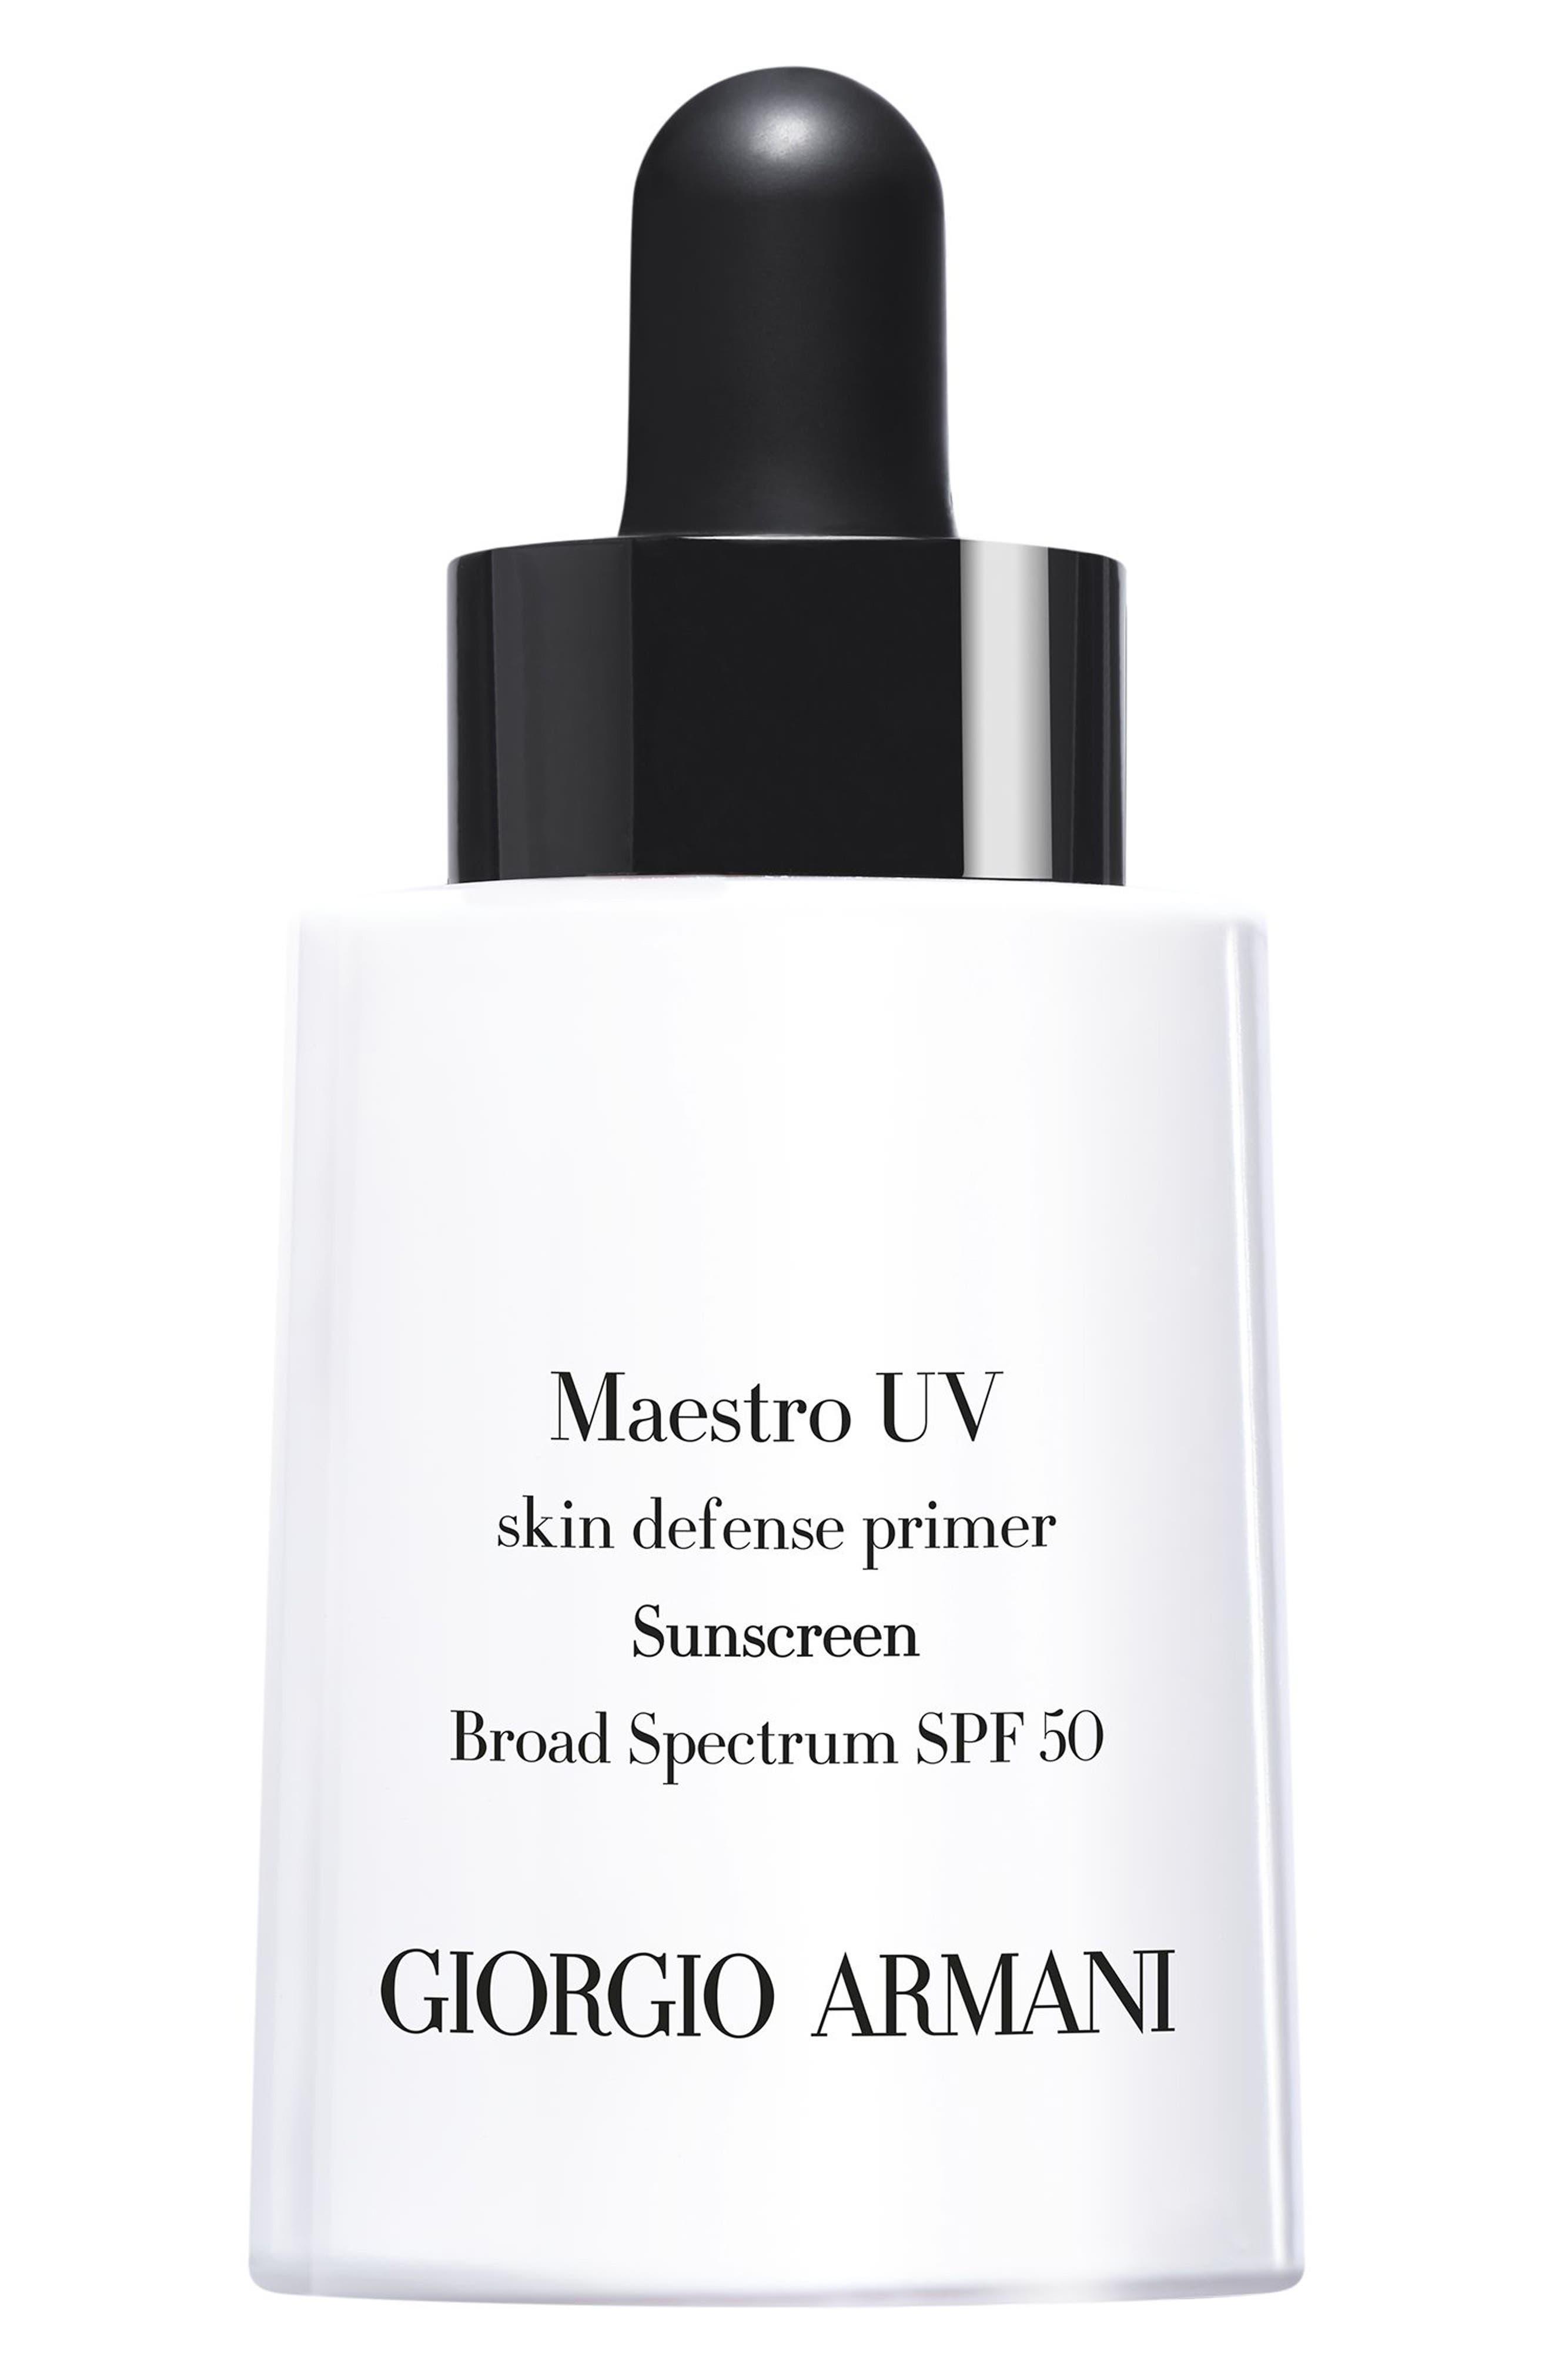 Maestro Uv Skin Defense Primer Sunscreen Spf 50